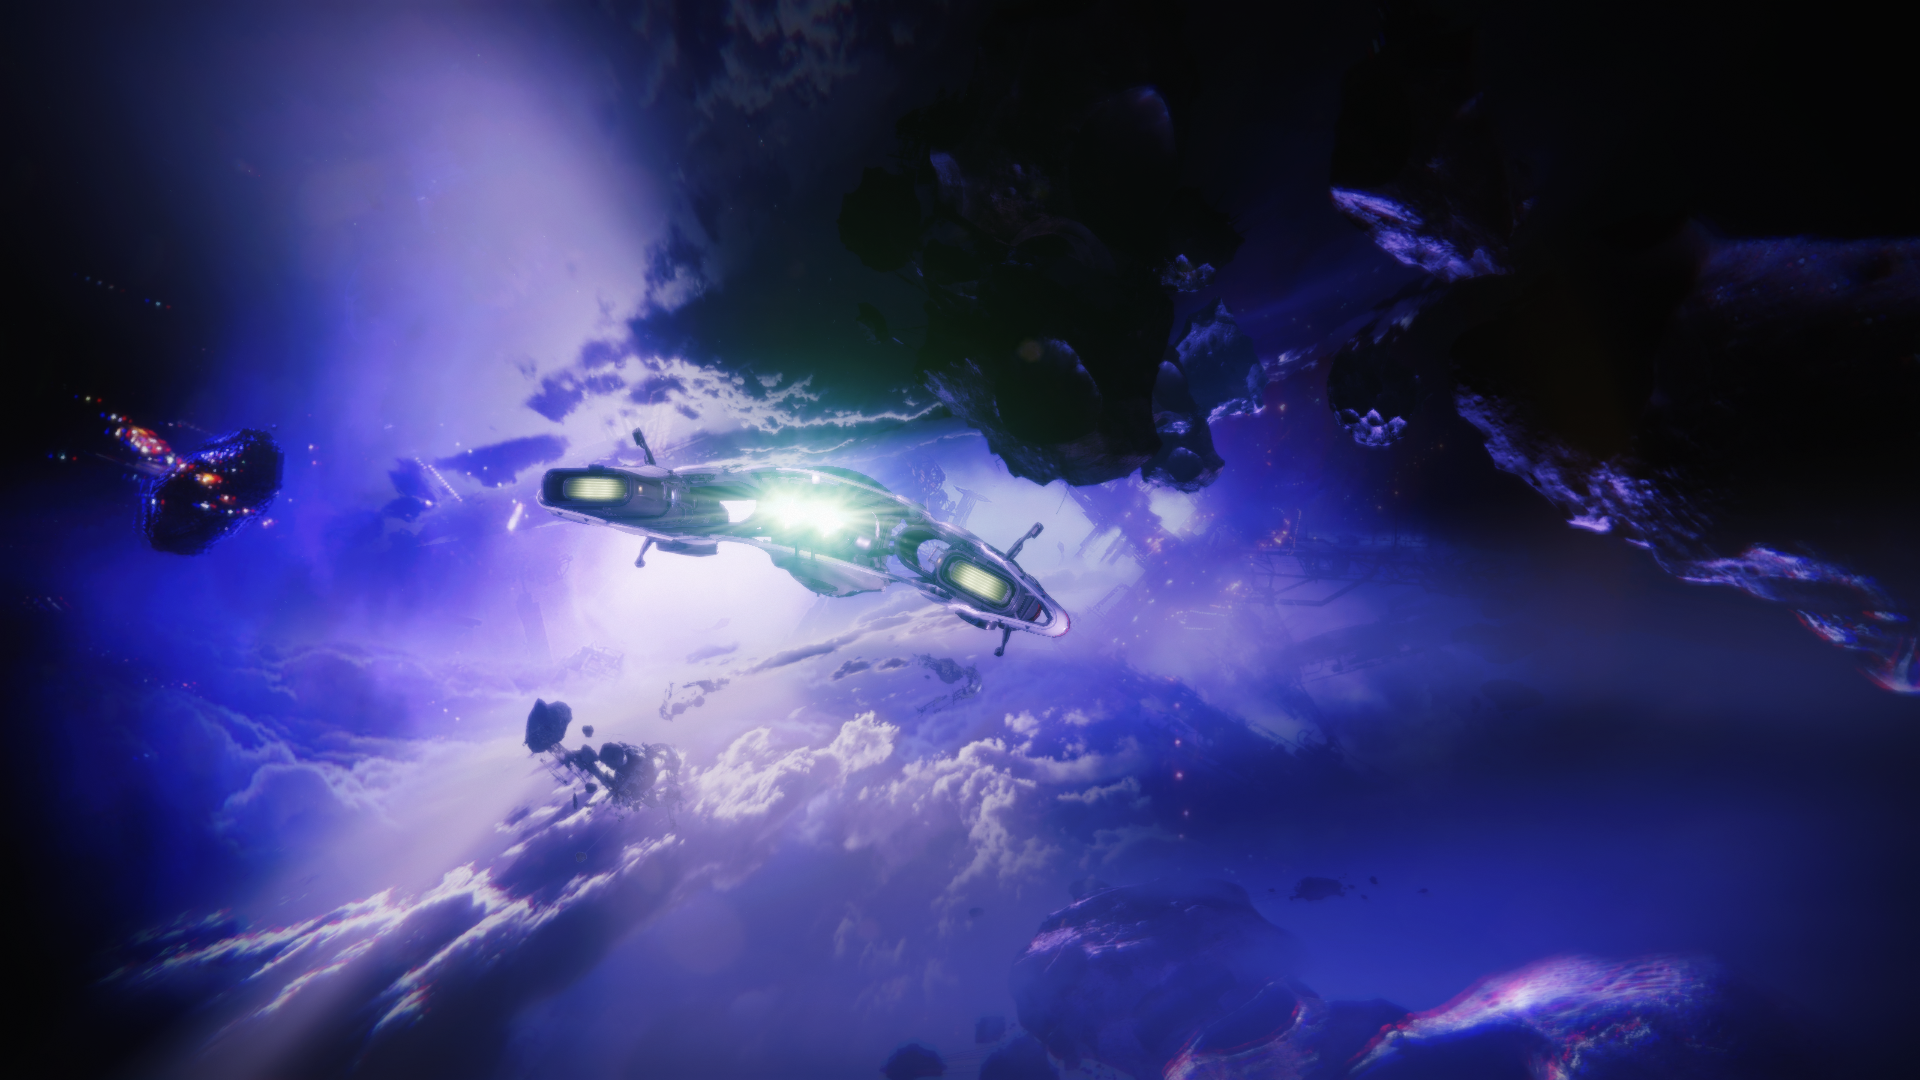 Destiny 2: Forsaken: Double Trouble Triumph and twin chests